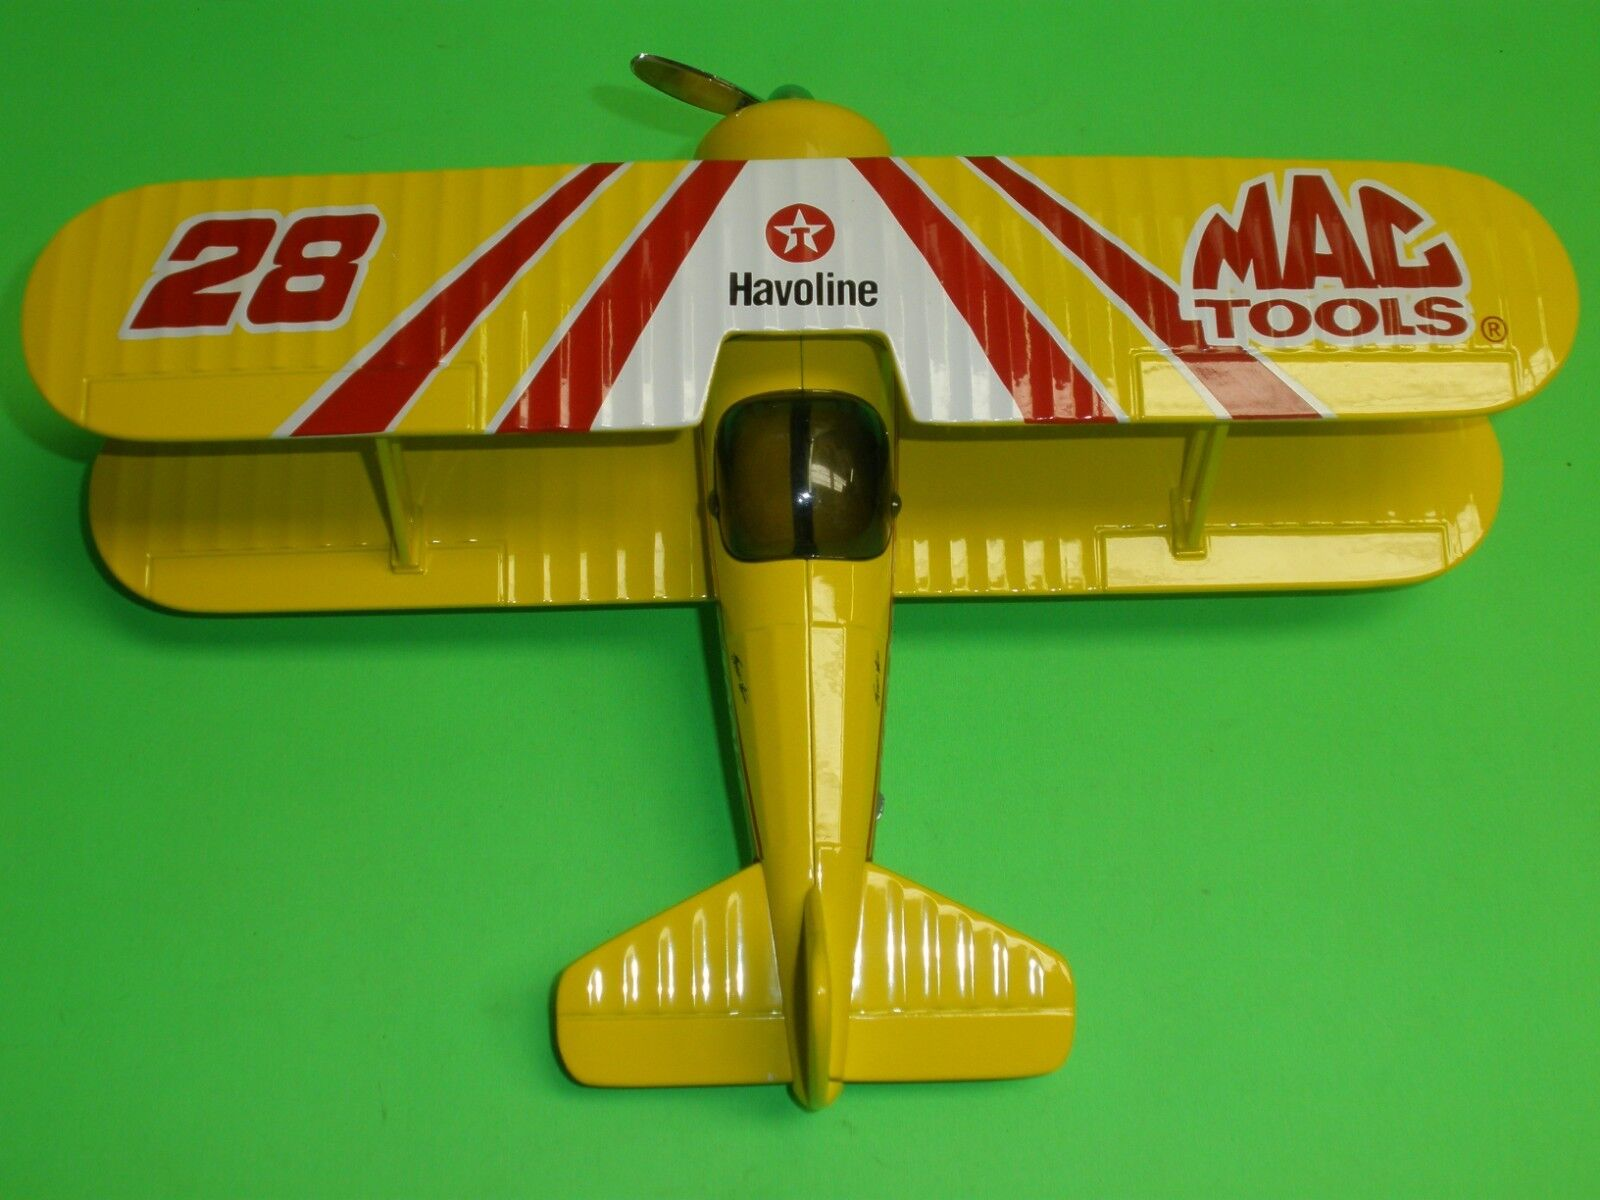 Mac Tools Texaco Havoline Stearman Bi-Avión Avión Diecast